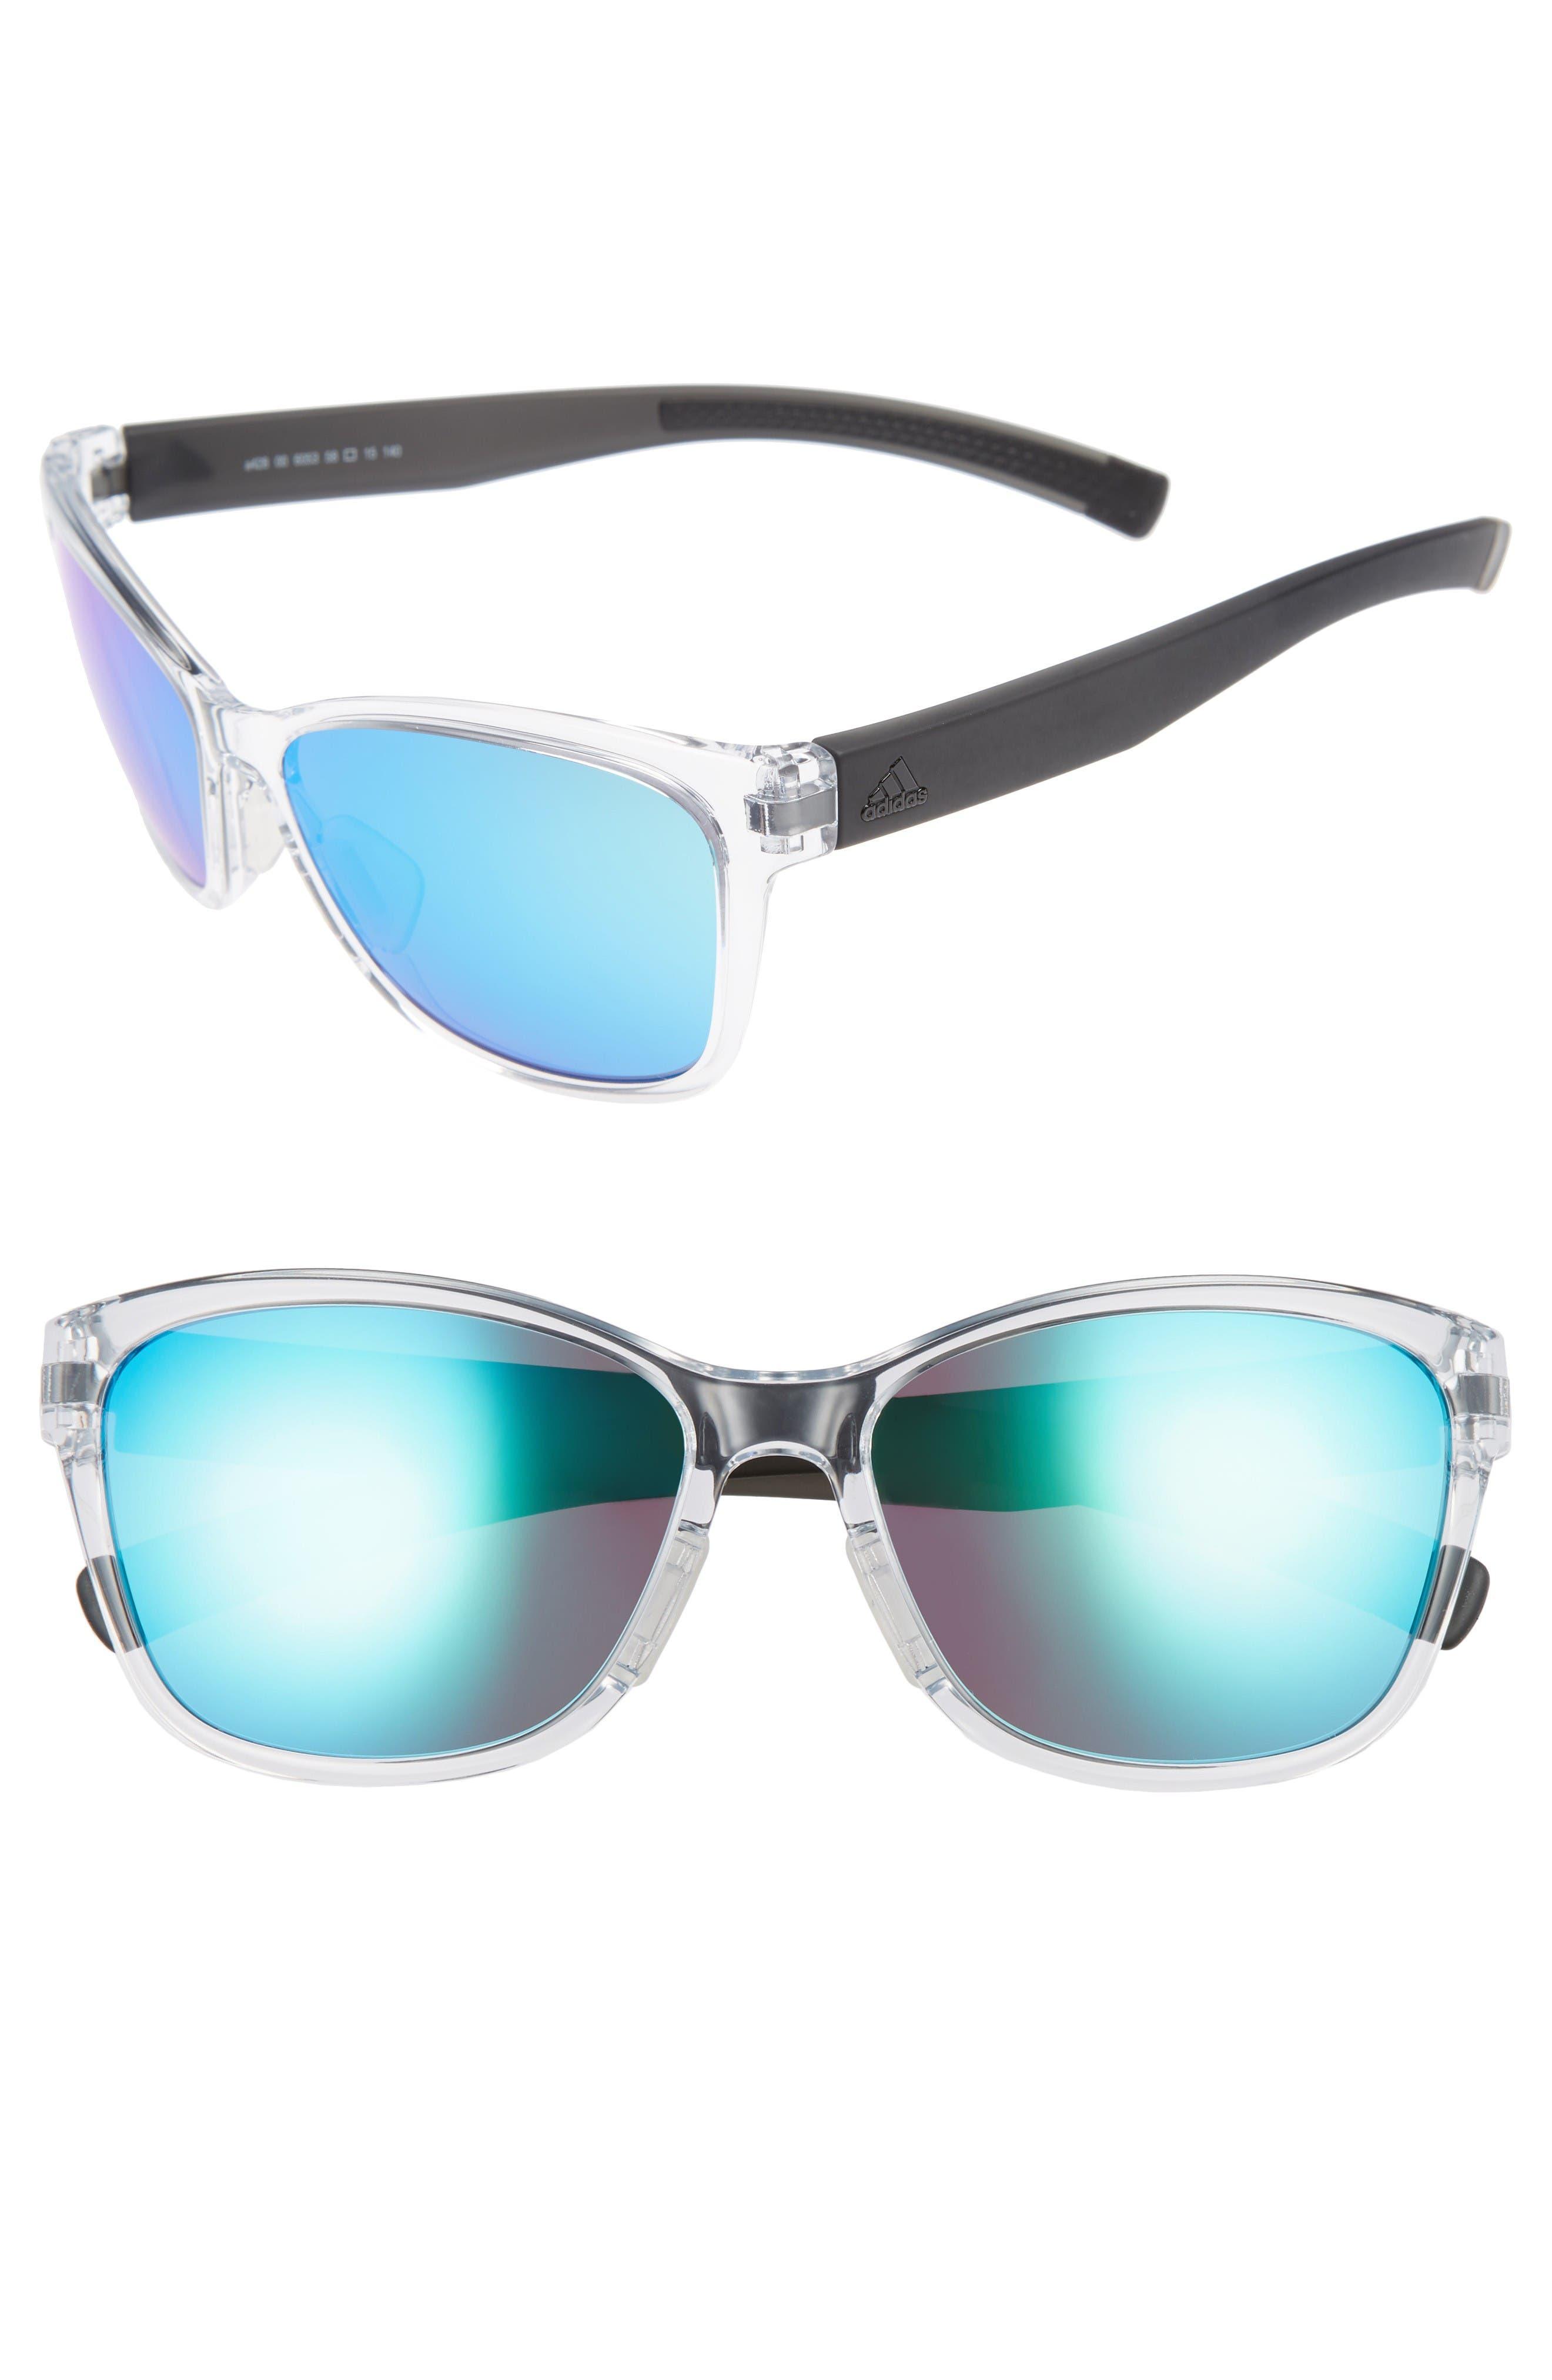 Main Image - adidas Excalate 58mm Mirrored Sunglasses